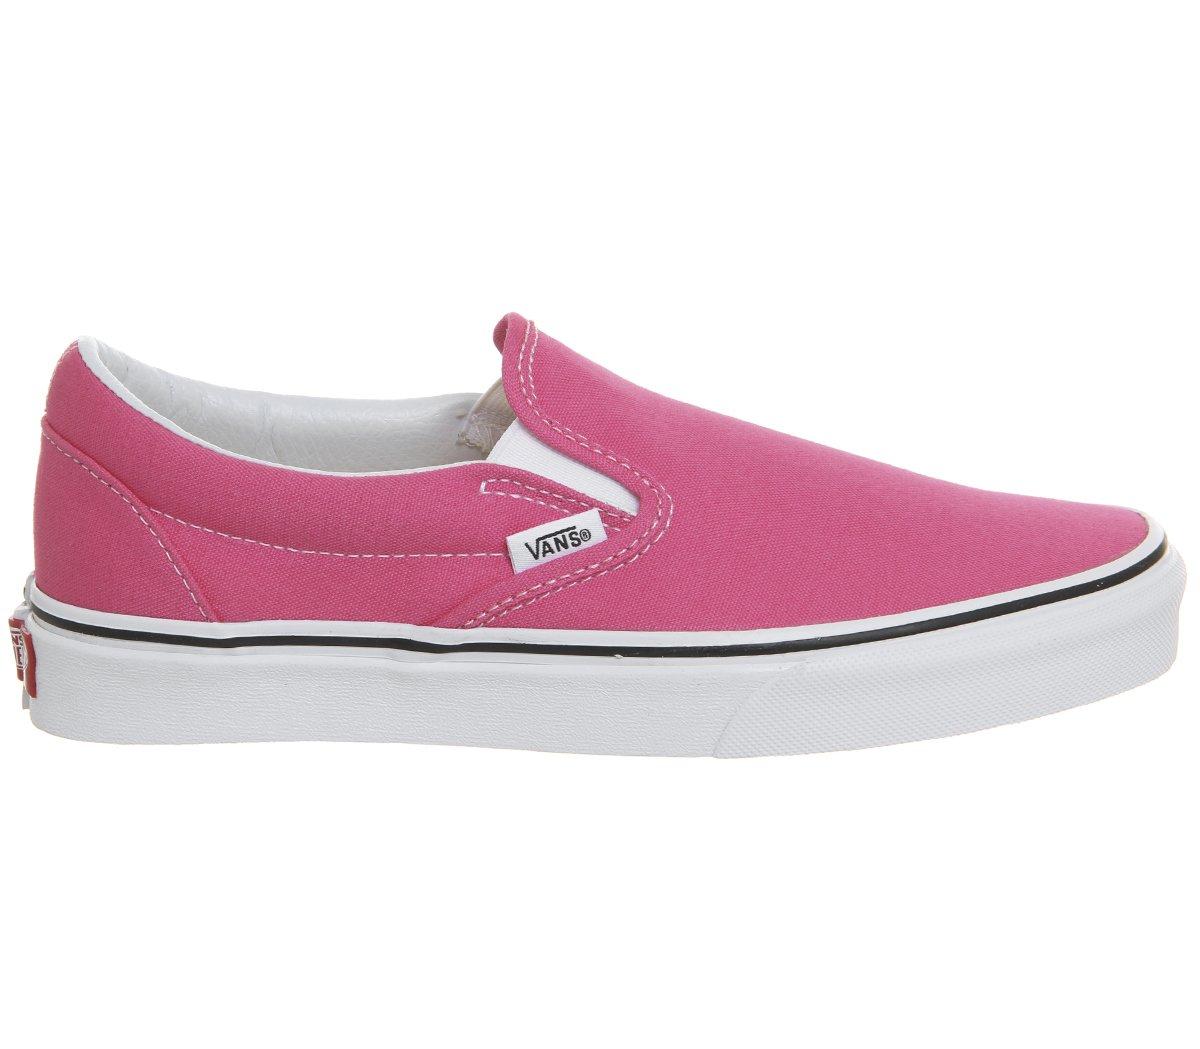 Vans Unisex-Erwachsene Classic Slip-on Slipper  40.5 EU|Hot Pink True White